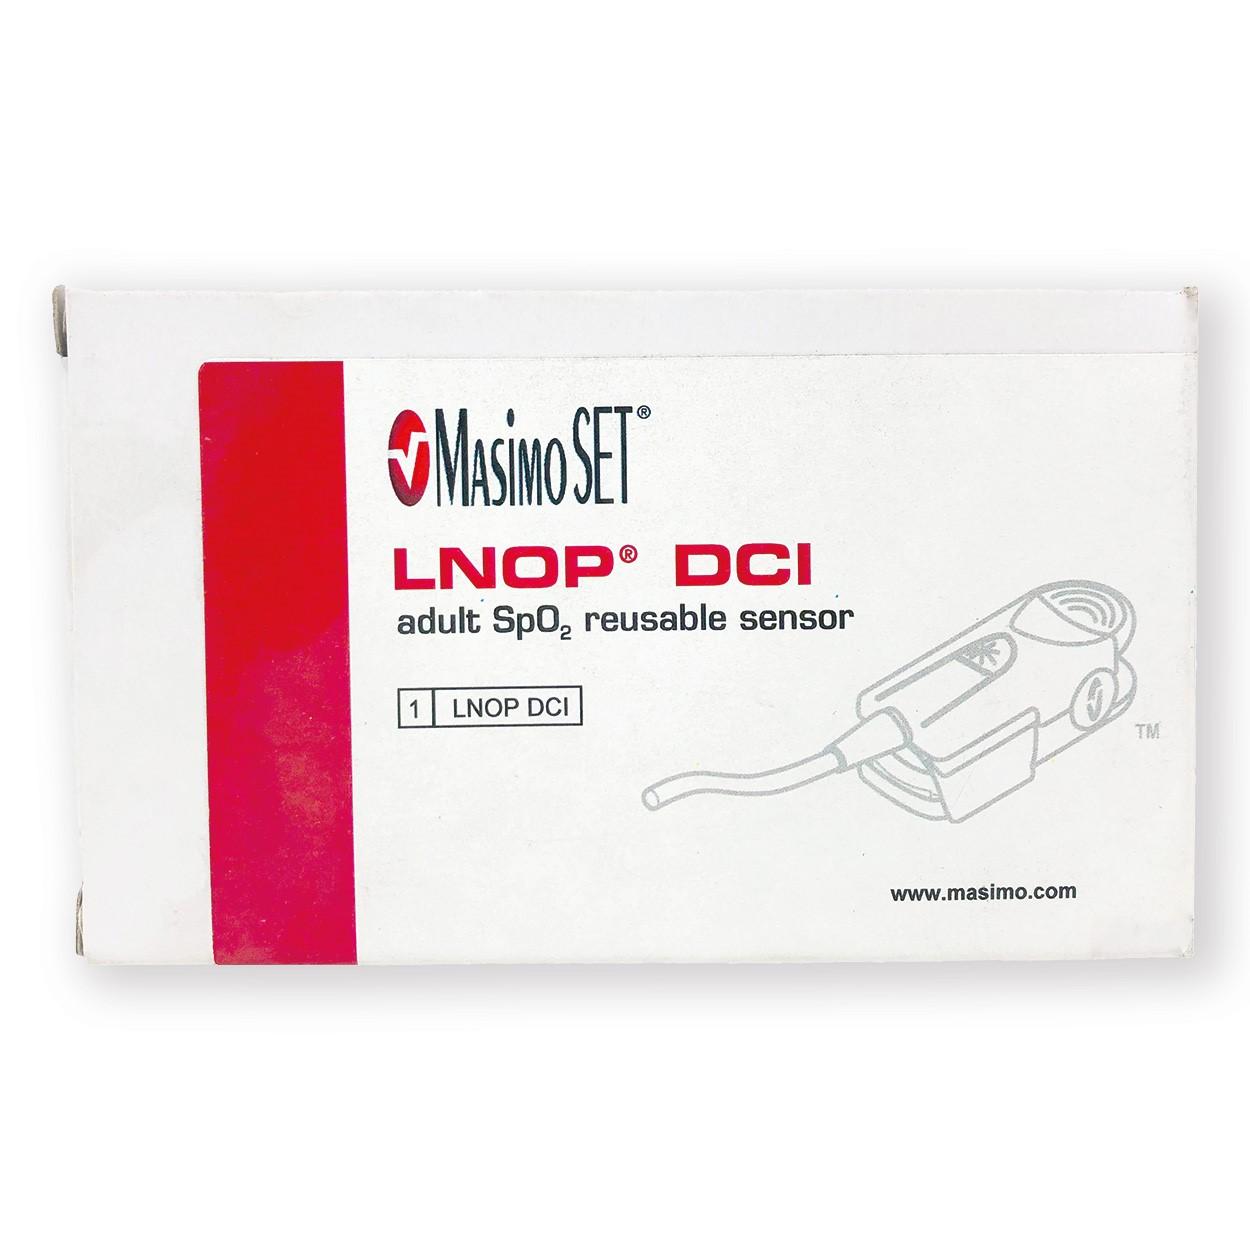 MASIMO LNOP DCI adult SpO2 reusable sensor - 1269